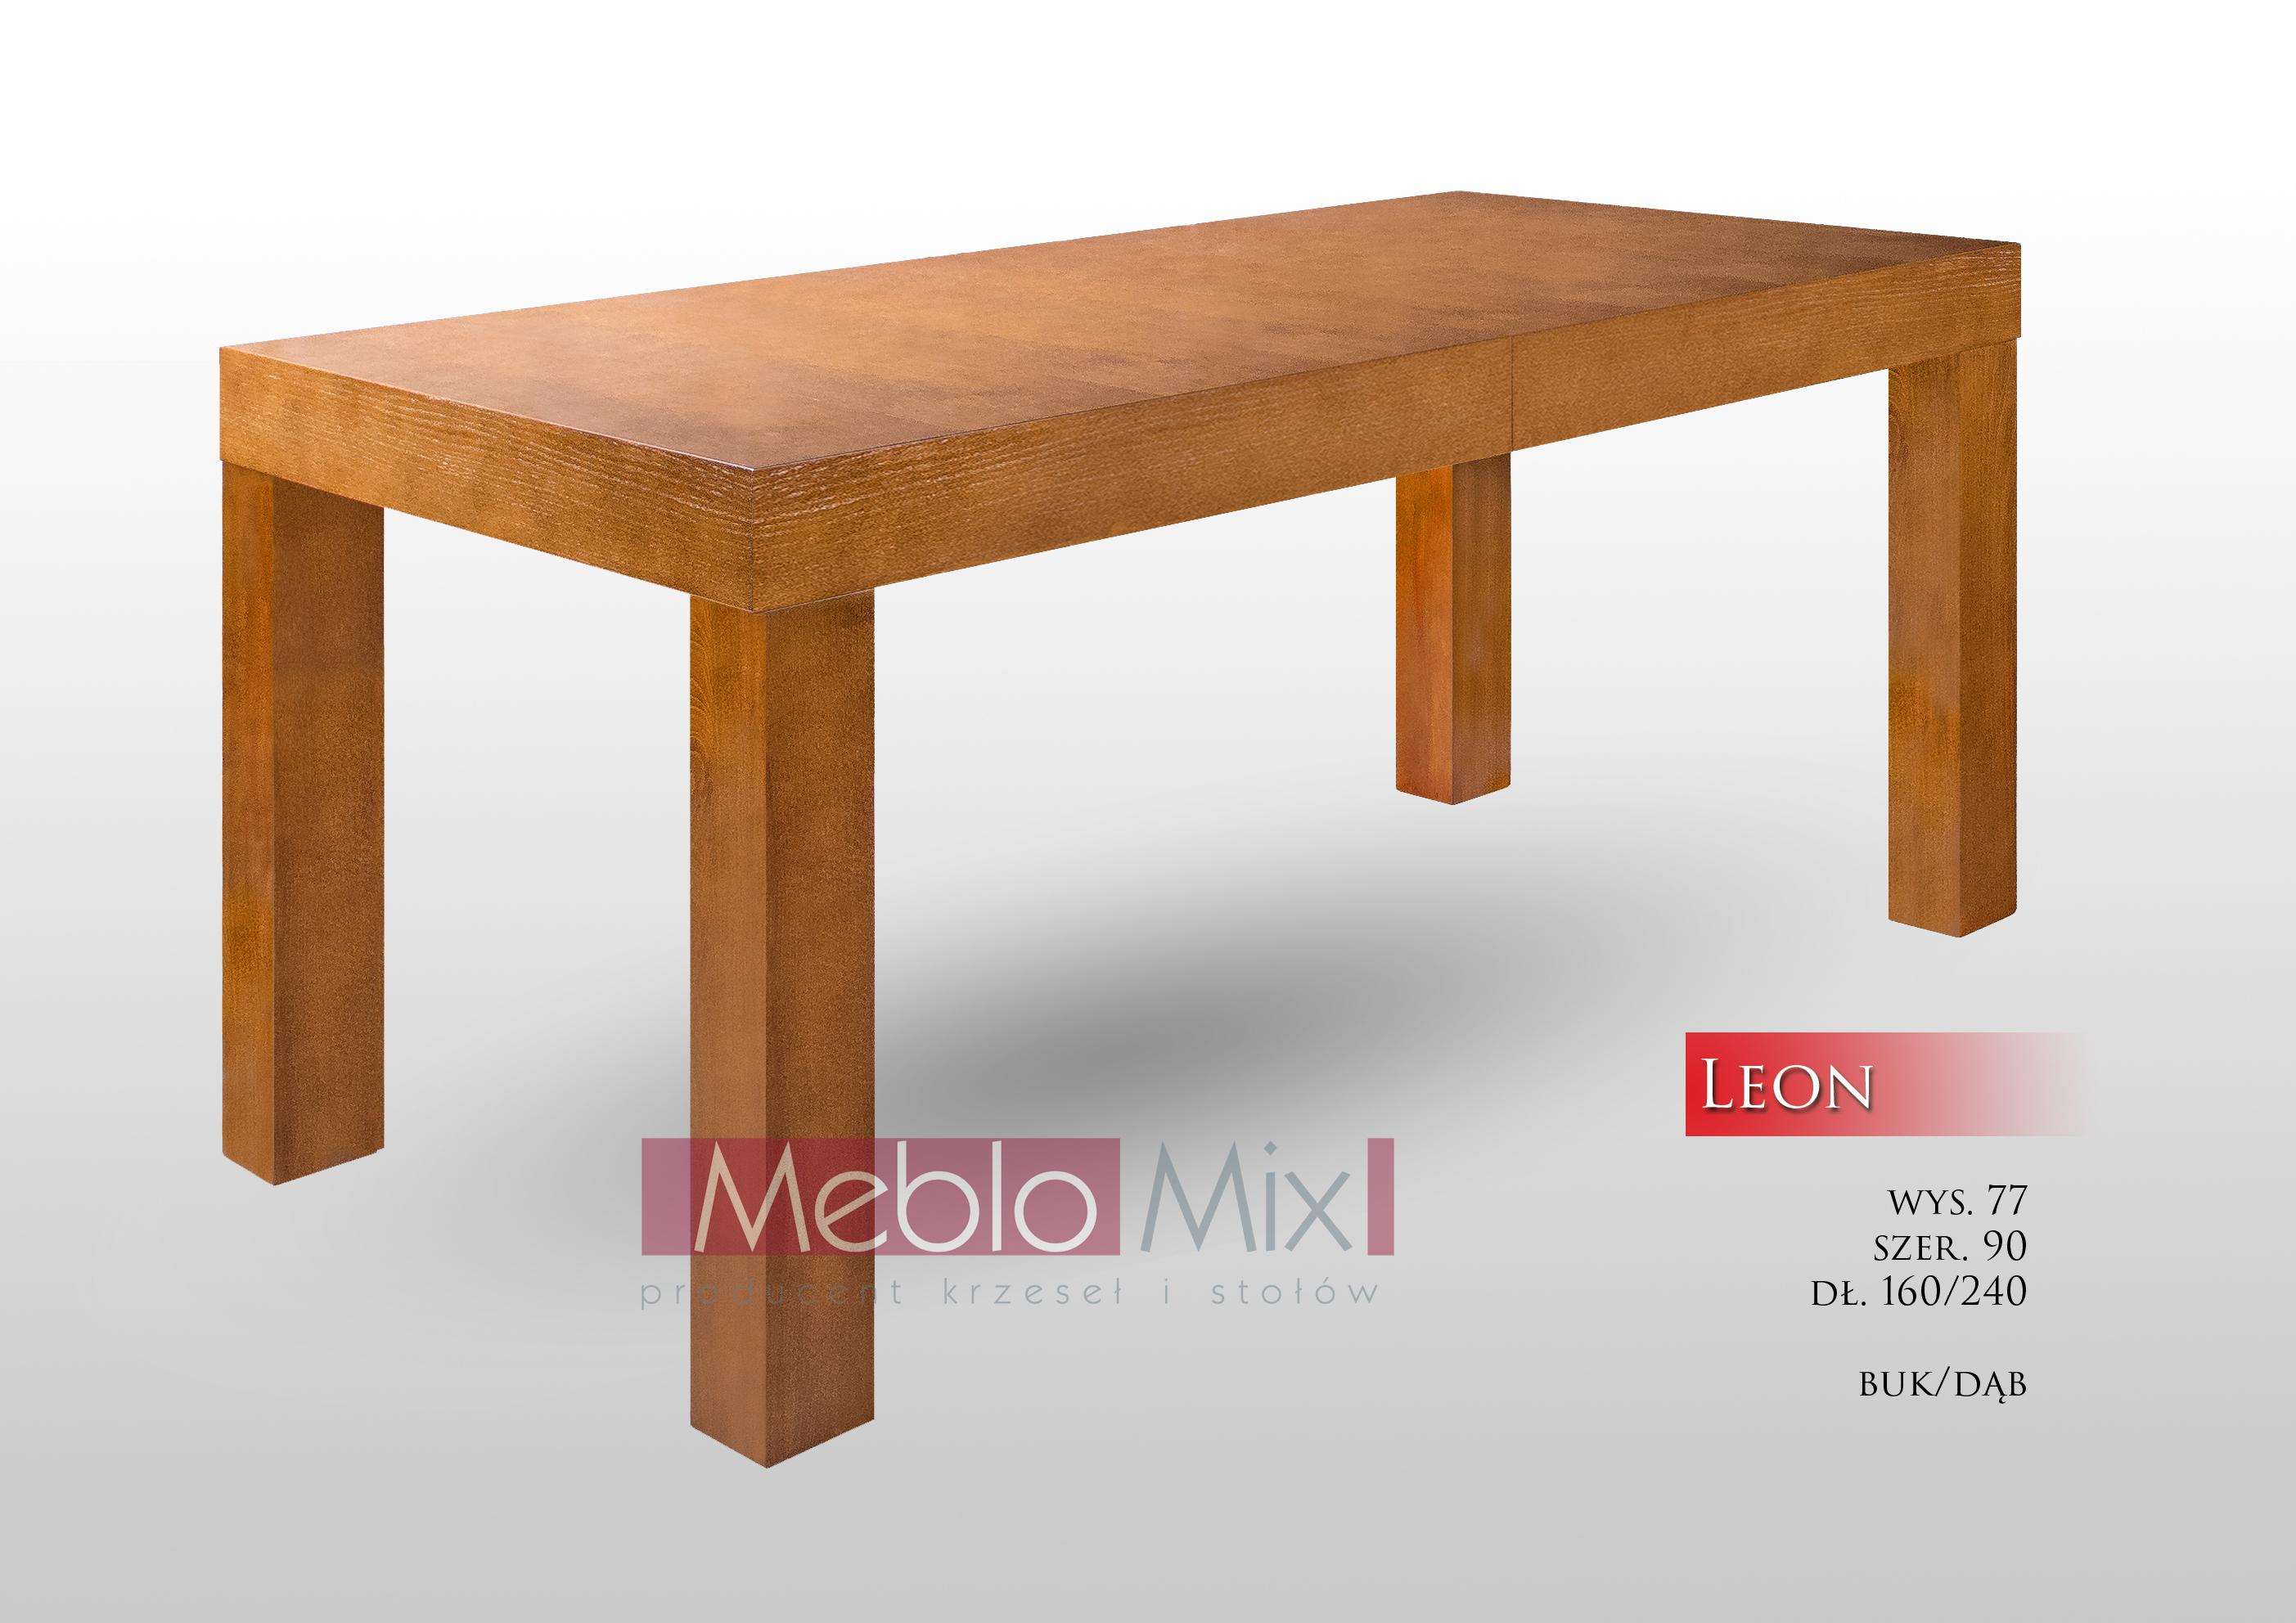 Stół Leon